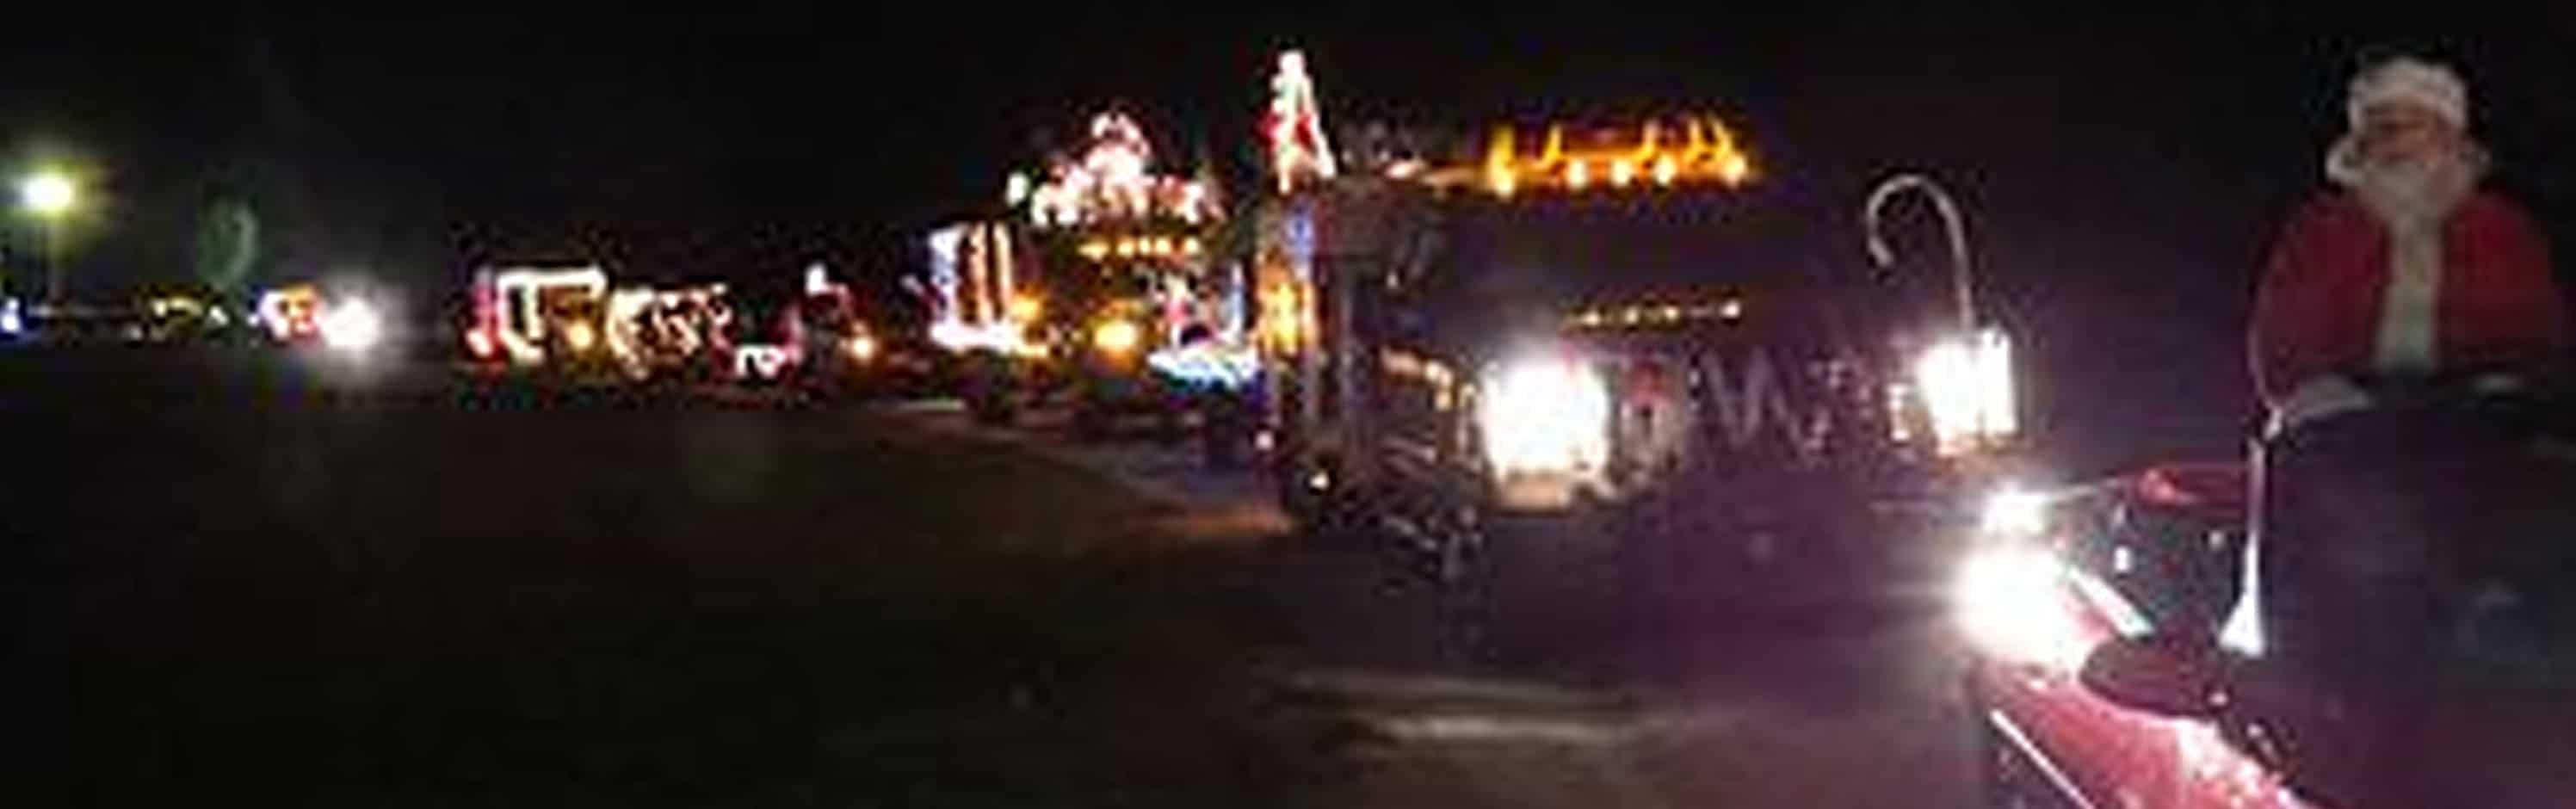 Bushnell Parade-1CROP